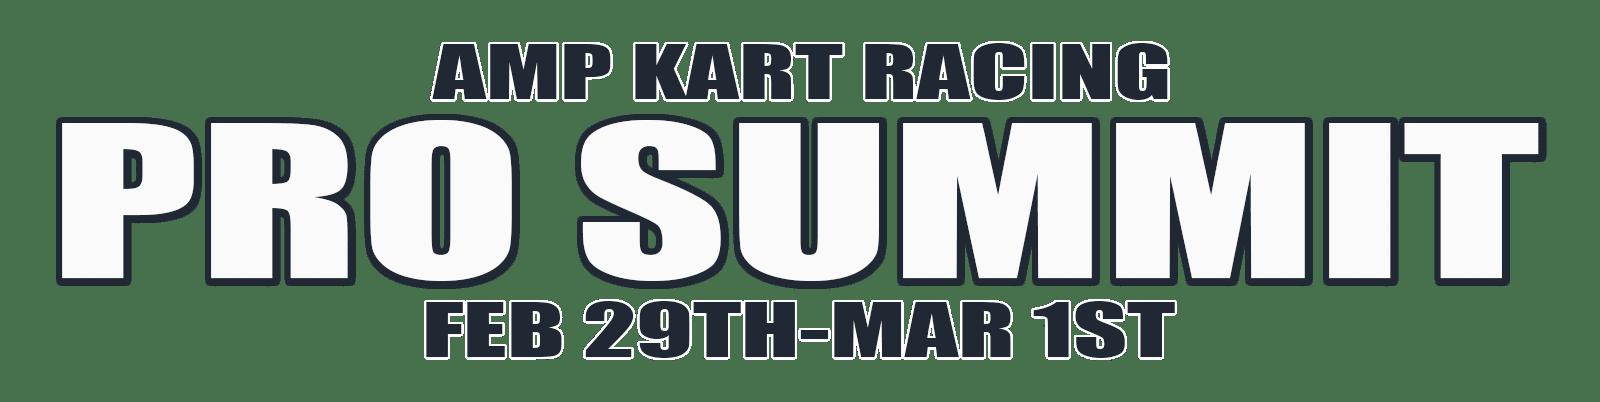 summit logo stroke 1 - AMP Kart Racing Pro Summit